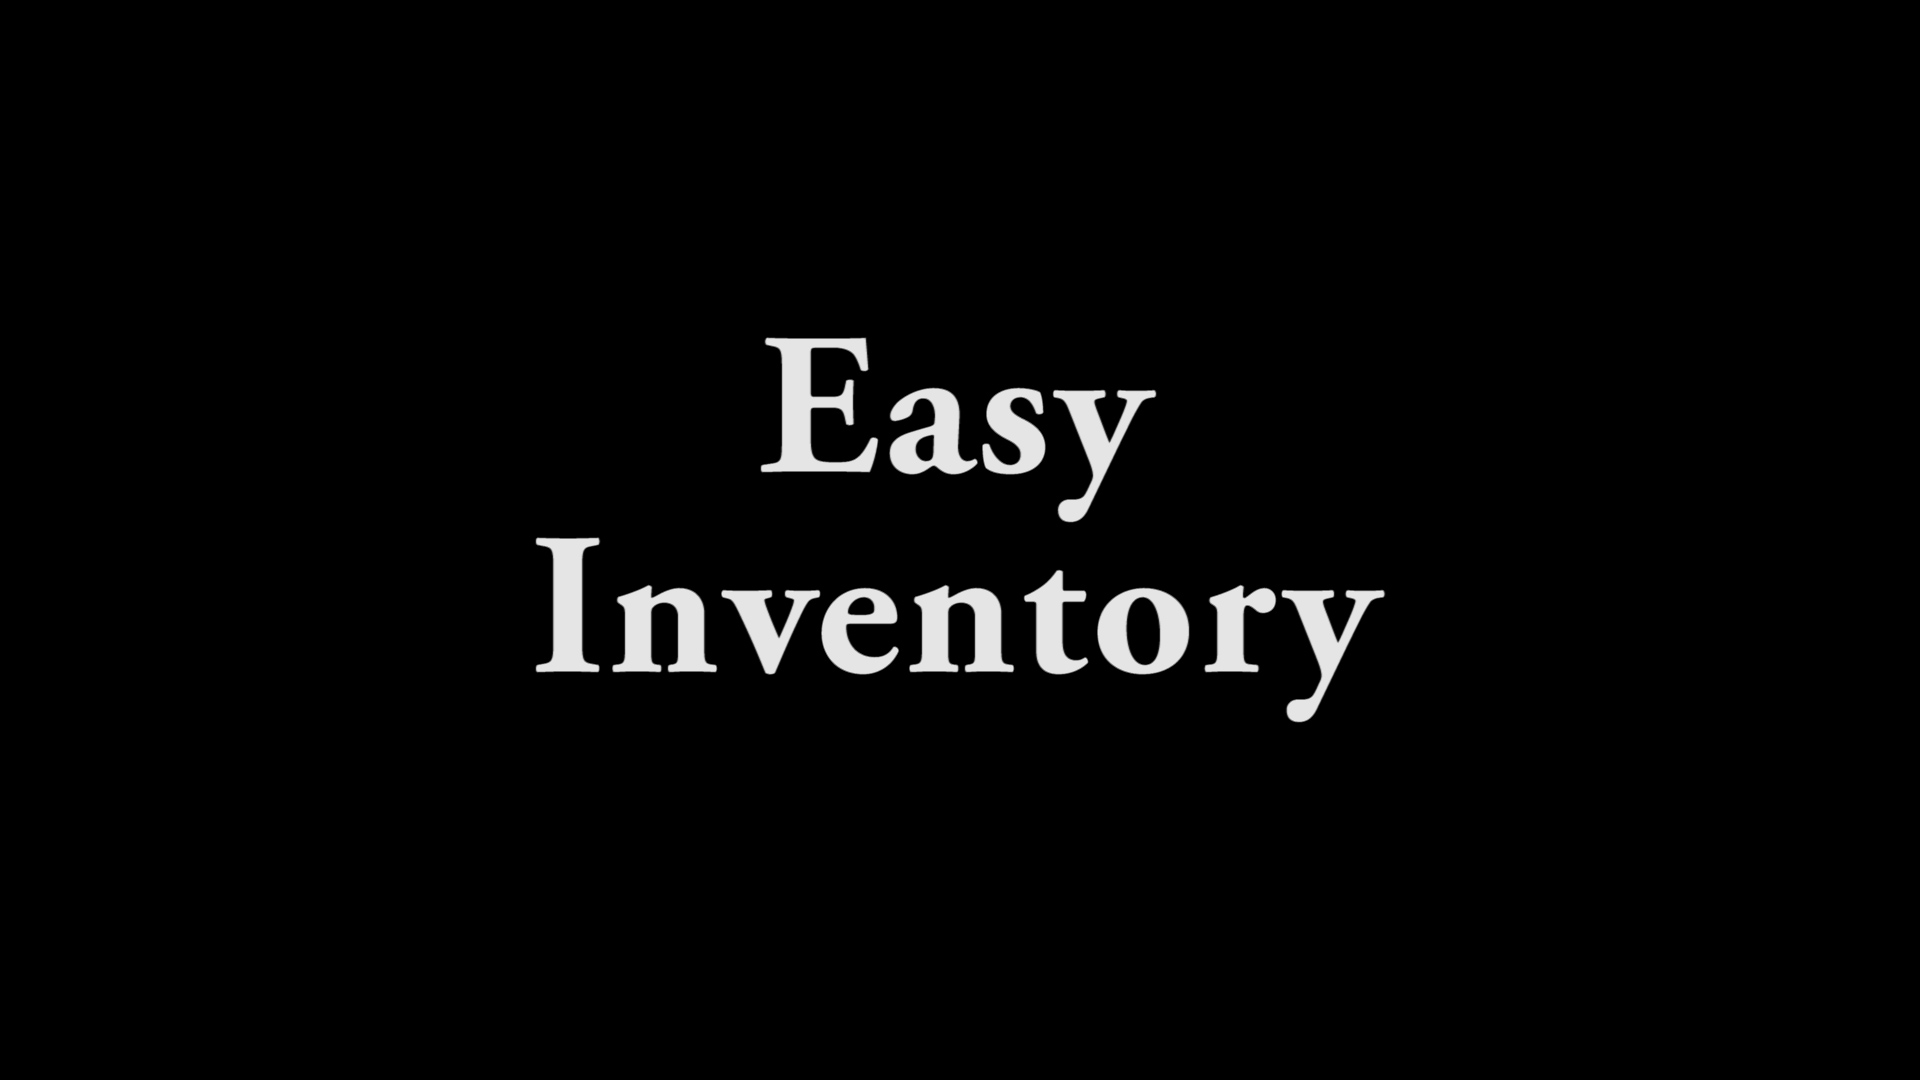 Easy Inventory